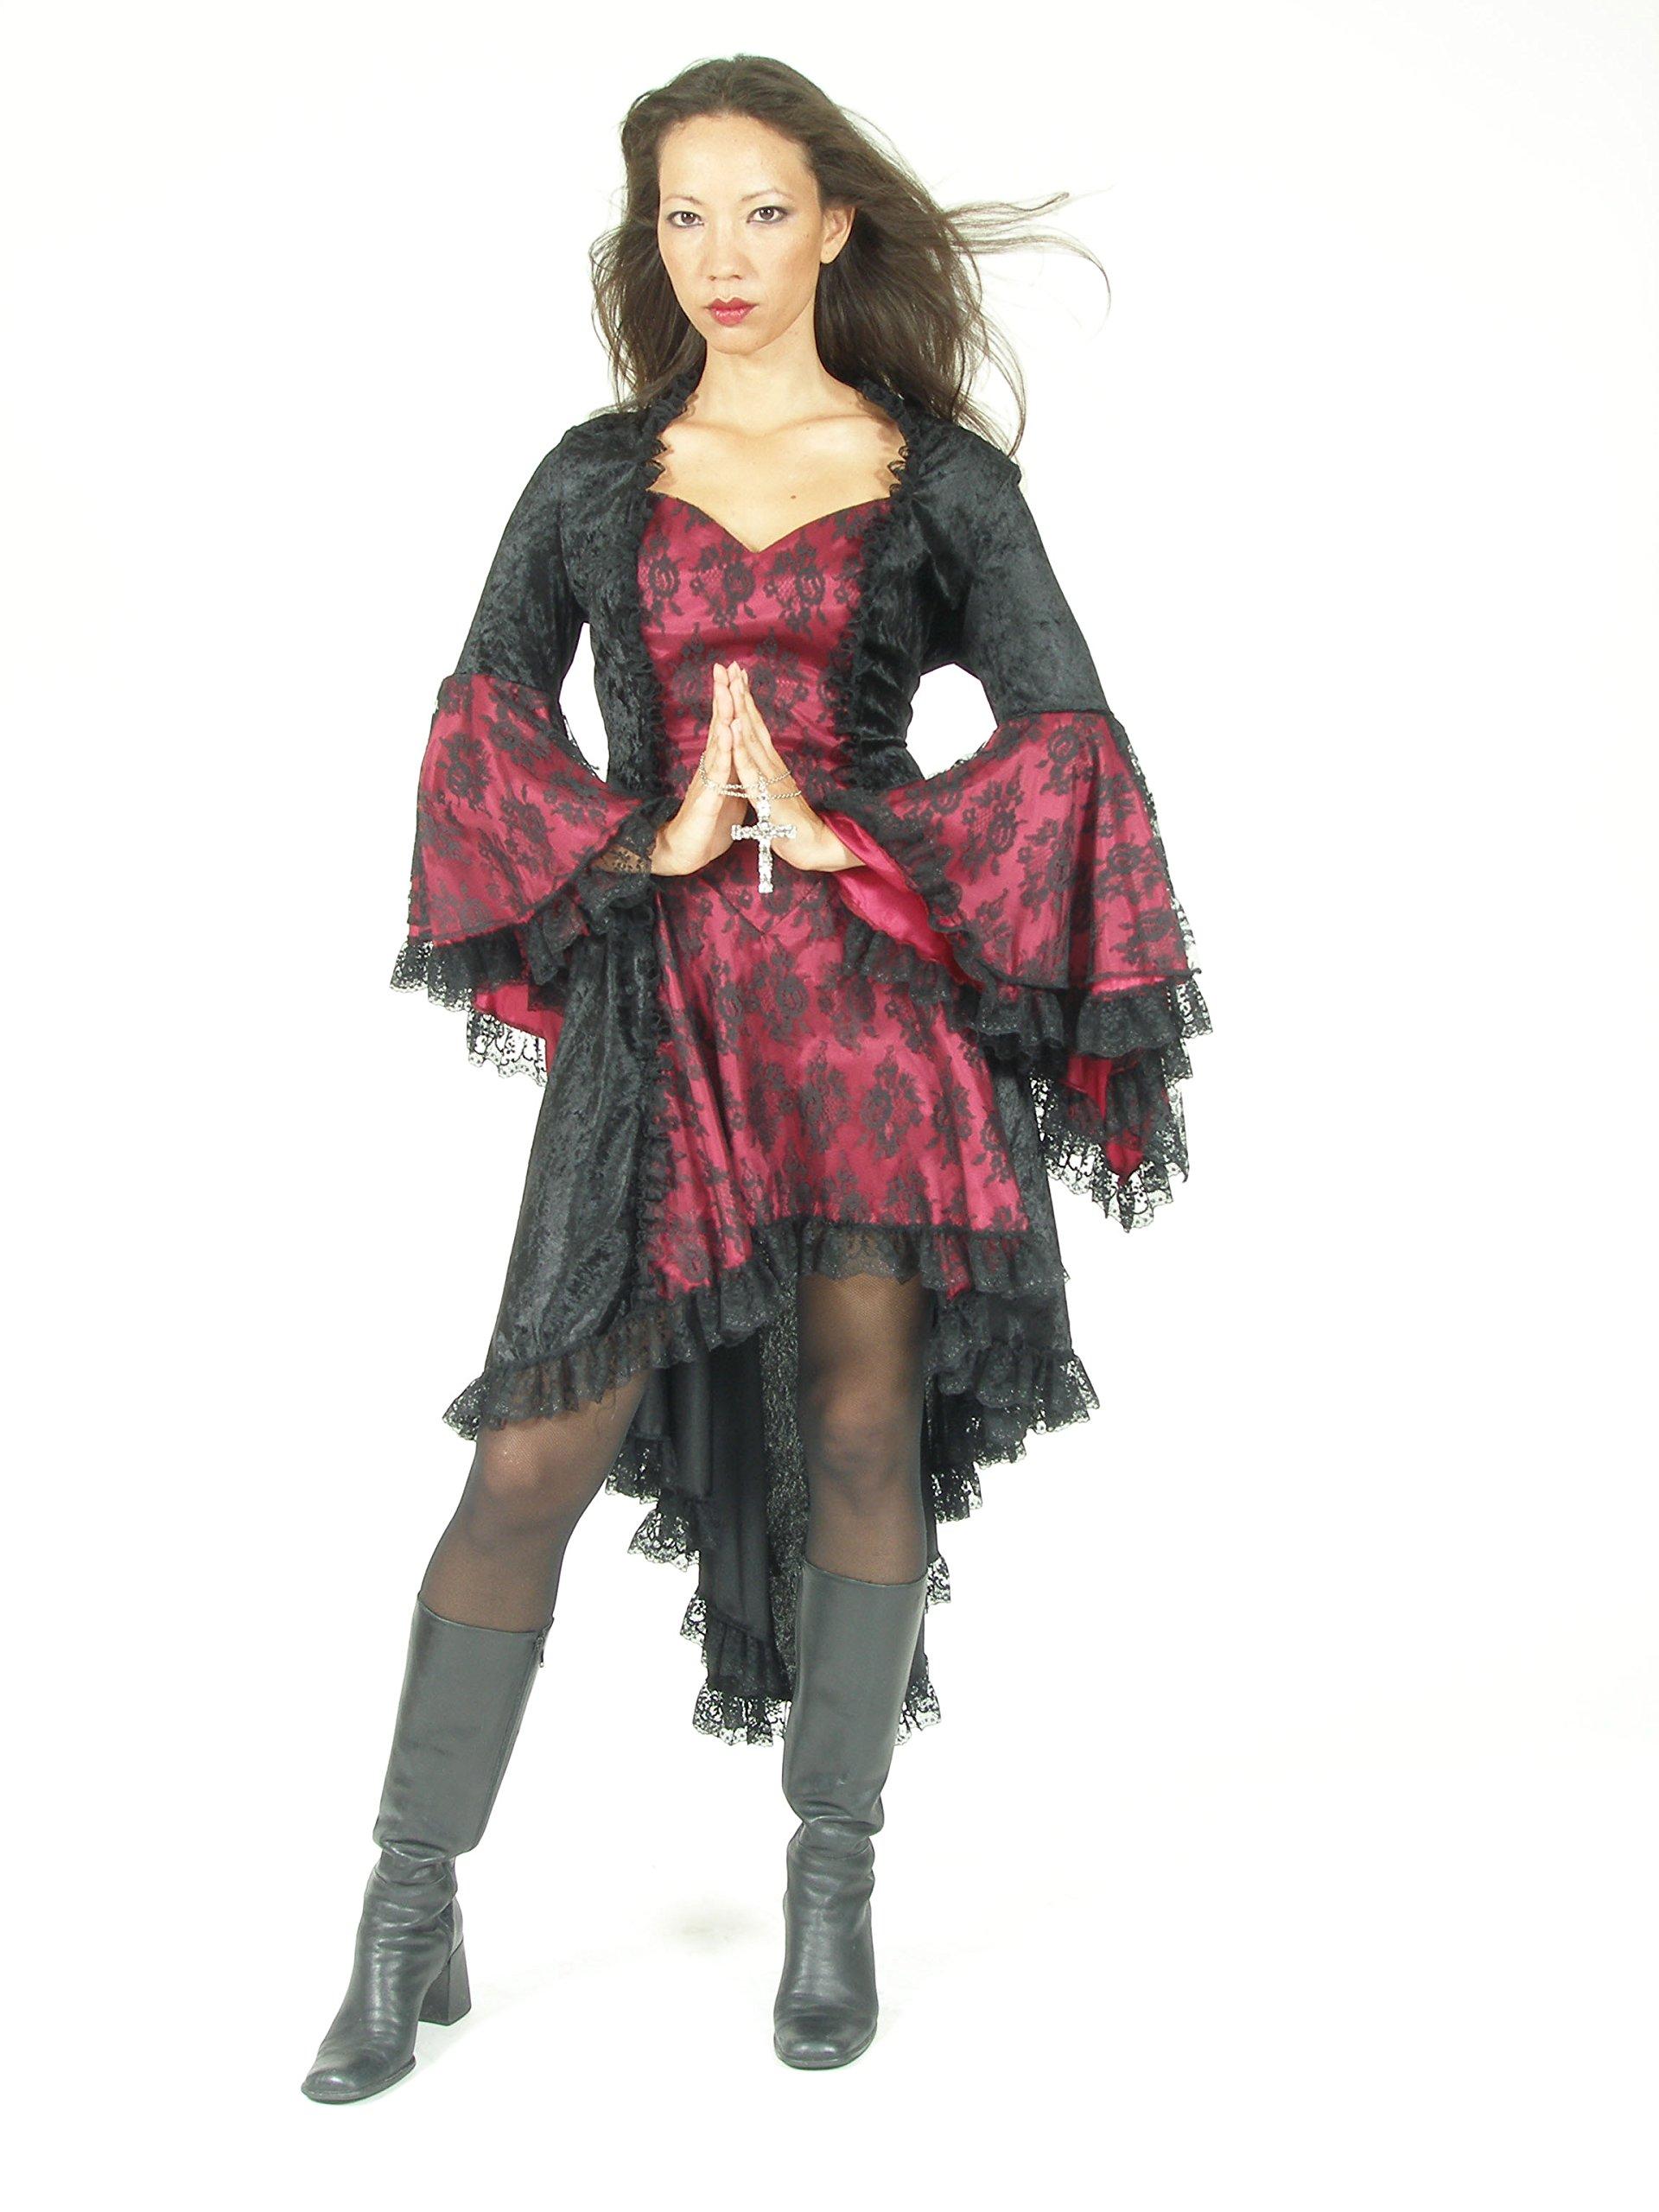 Eternal Love Plus Size Black Burgundy Wine Gothic Gwendolyn Dress Taffeta Lace (2X) by Eternal Love